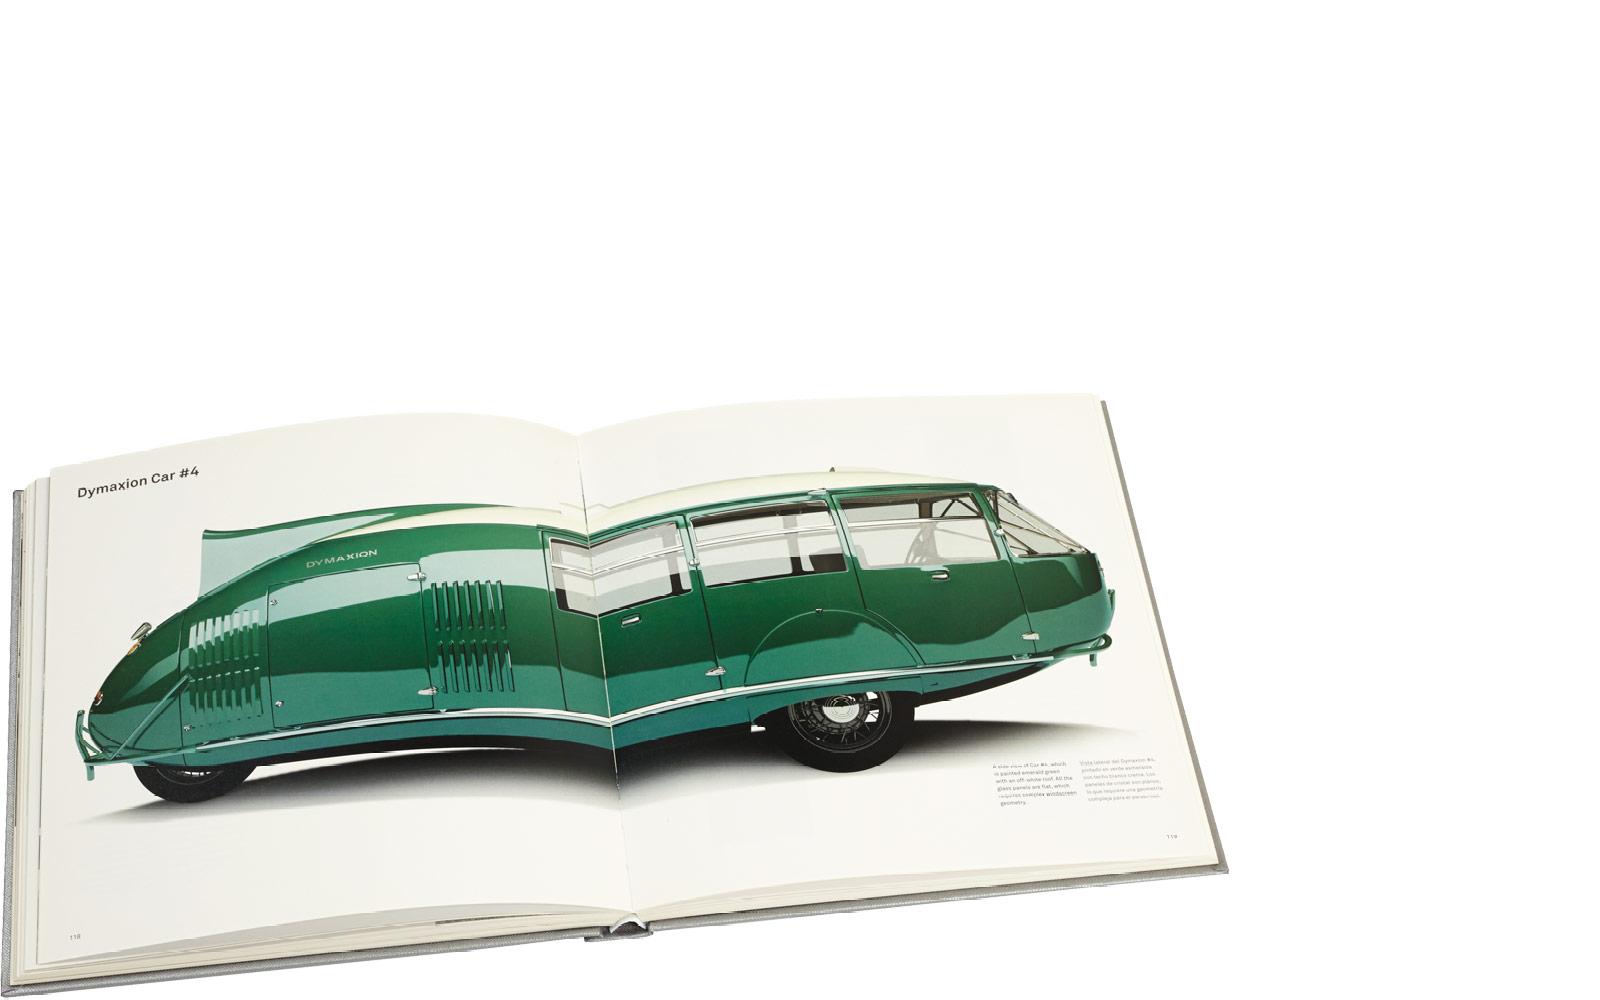 Buckminster Fuller: Dymaxion Car